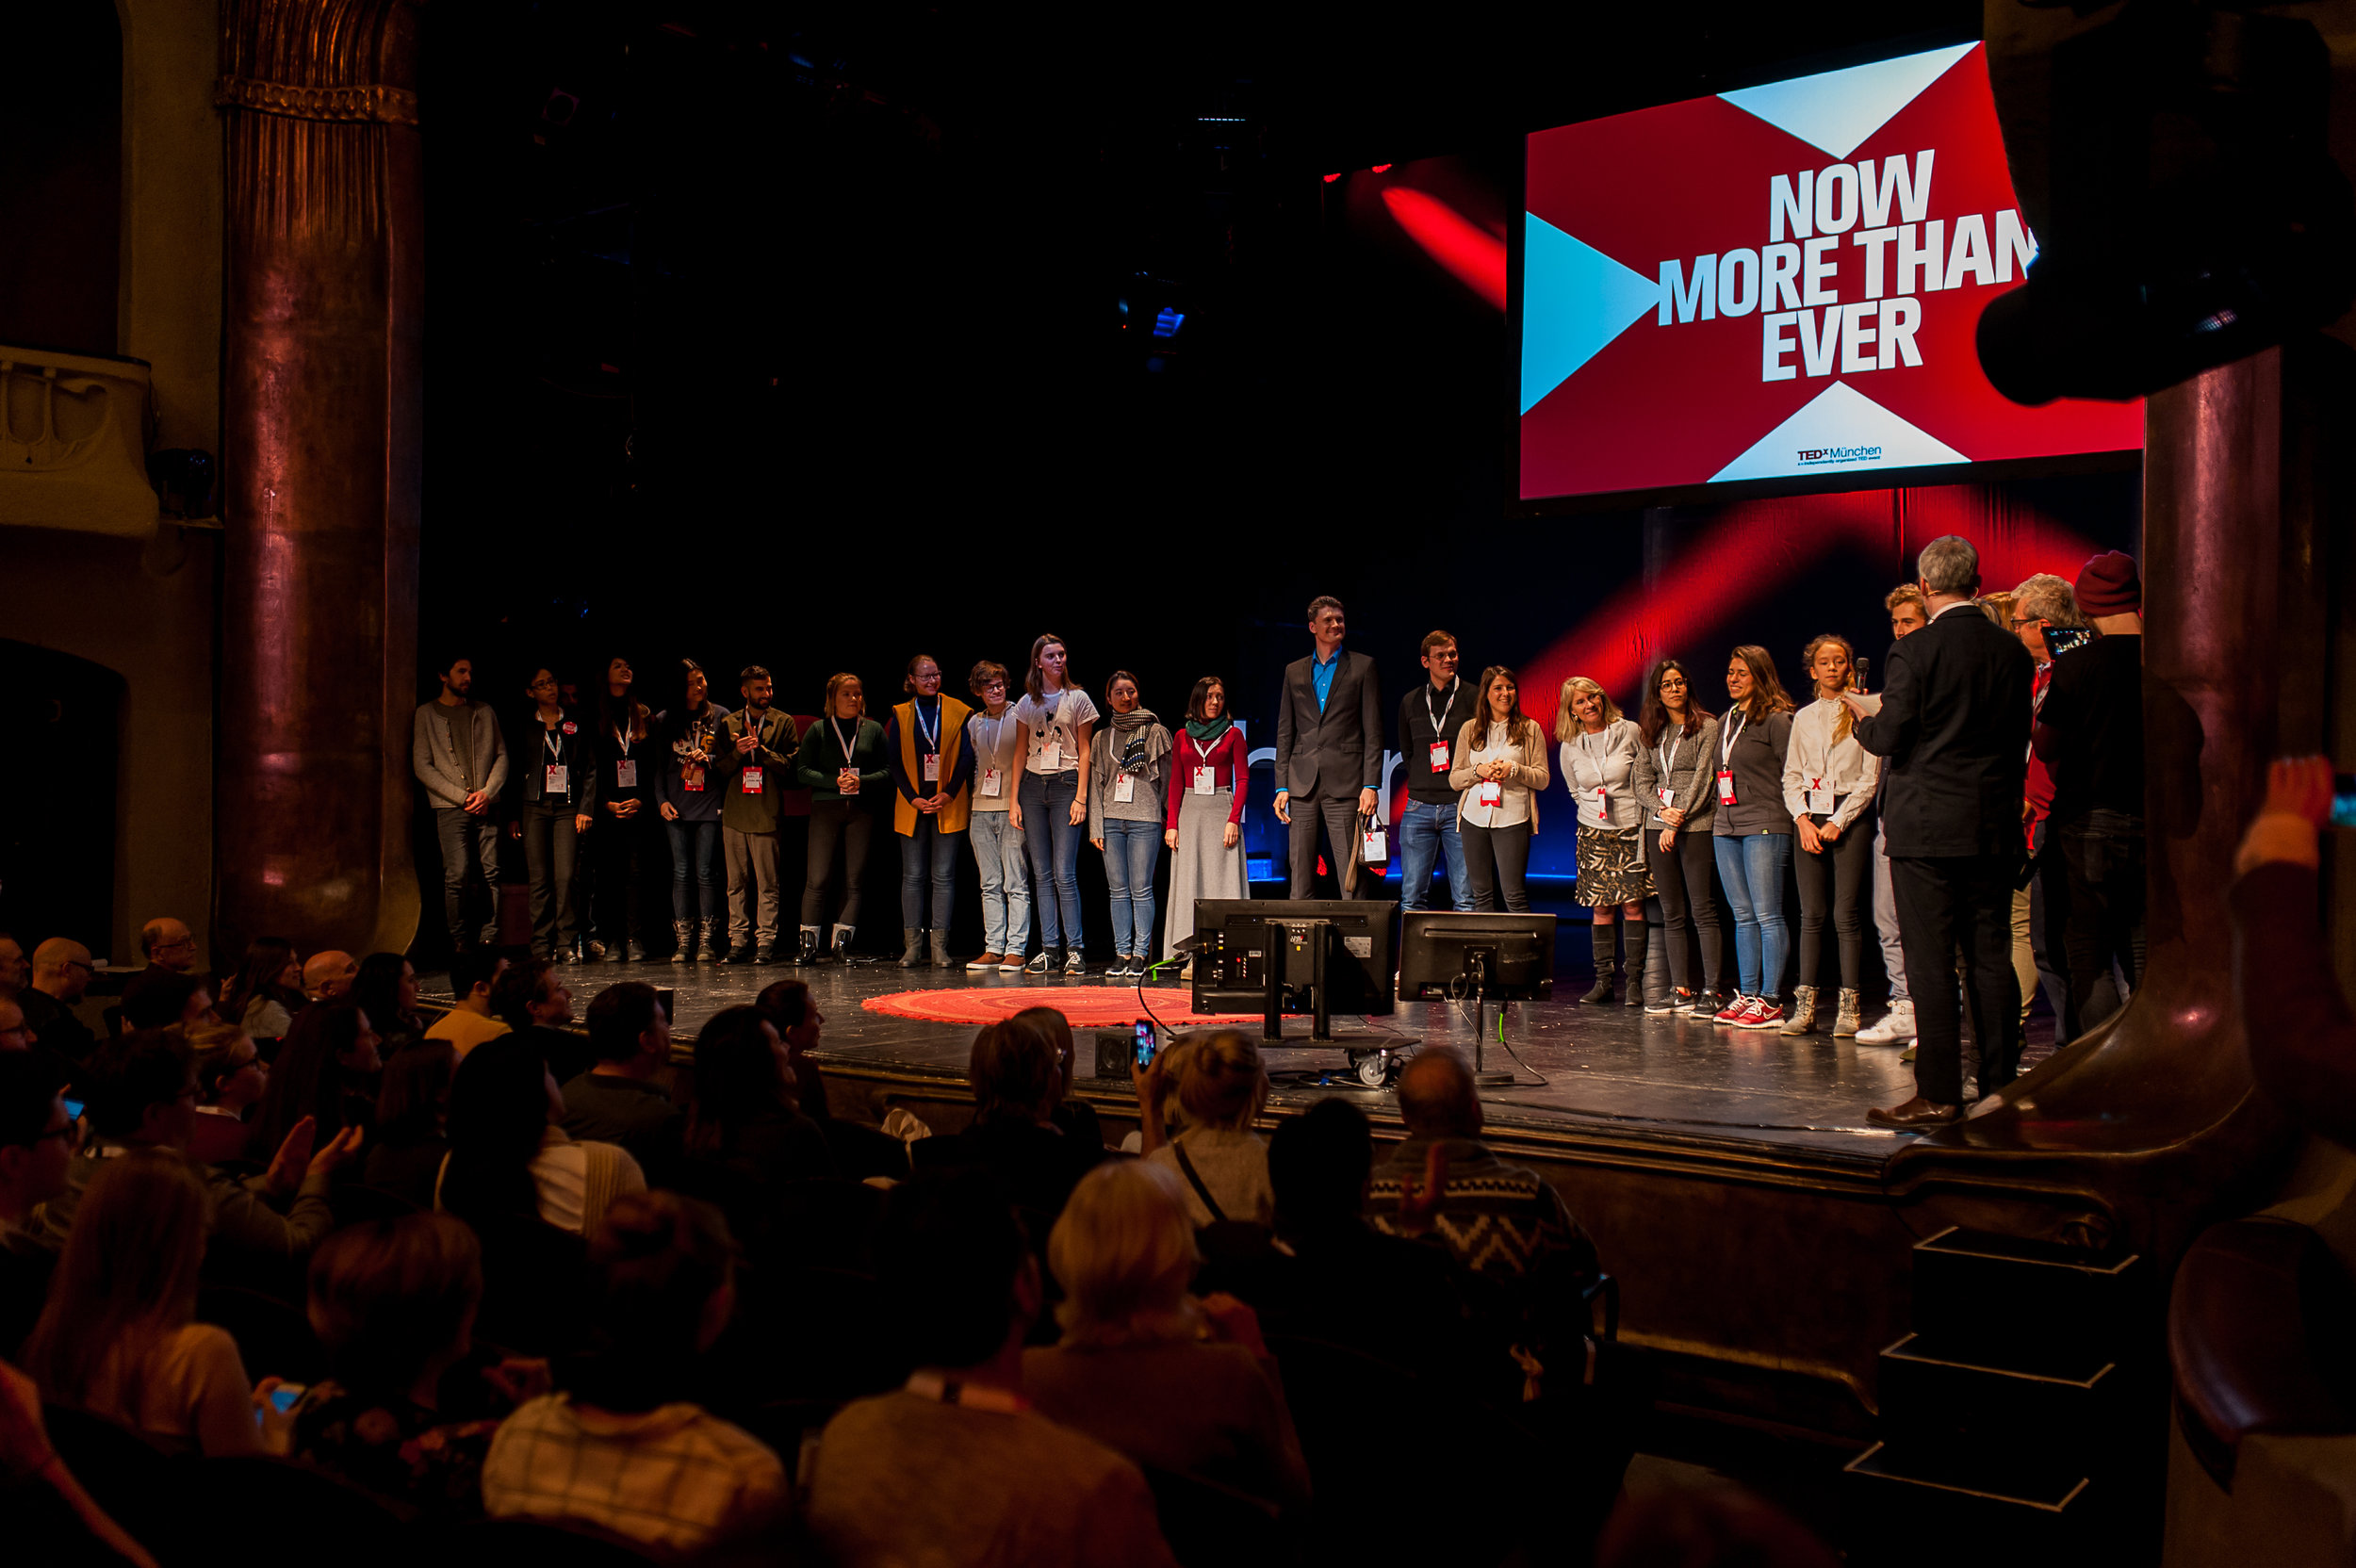 TEDx2017-171119-167.jpg